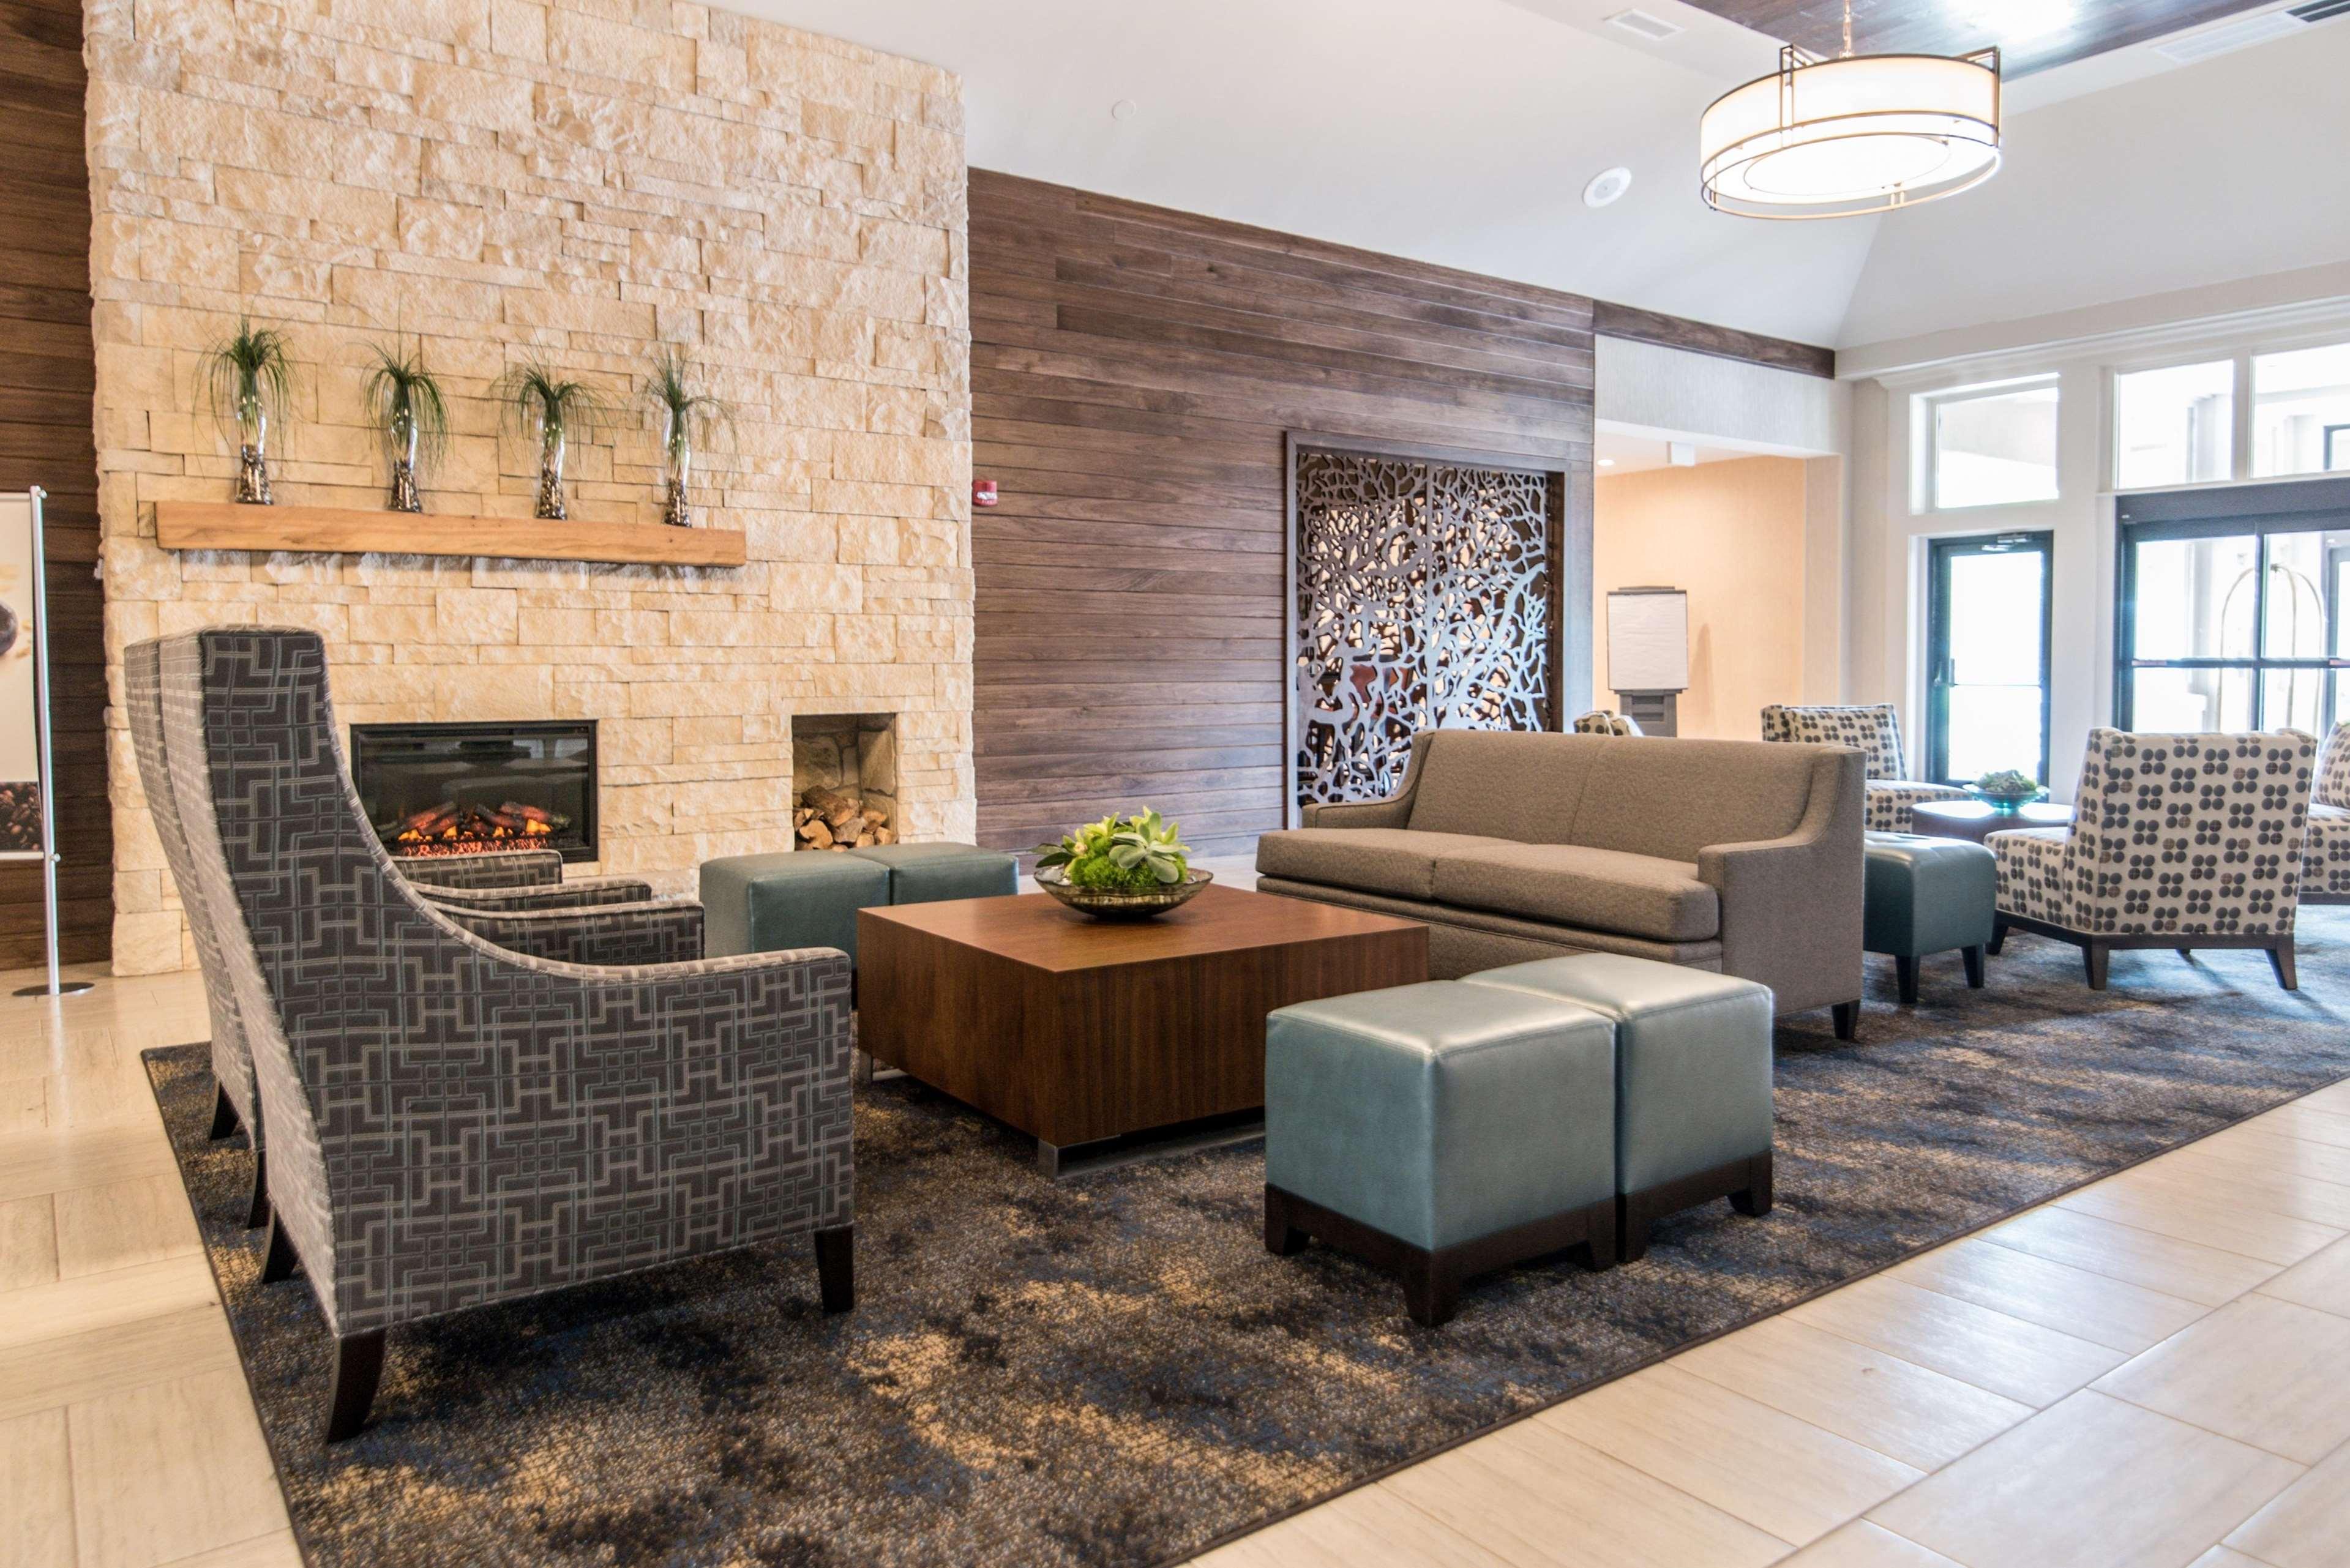 Doubletree By Hilton Hotel Cleveland Westlake 1100 Crocker Road Oh Hotels Motels Mapquest